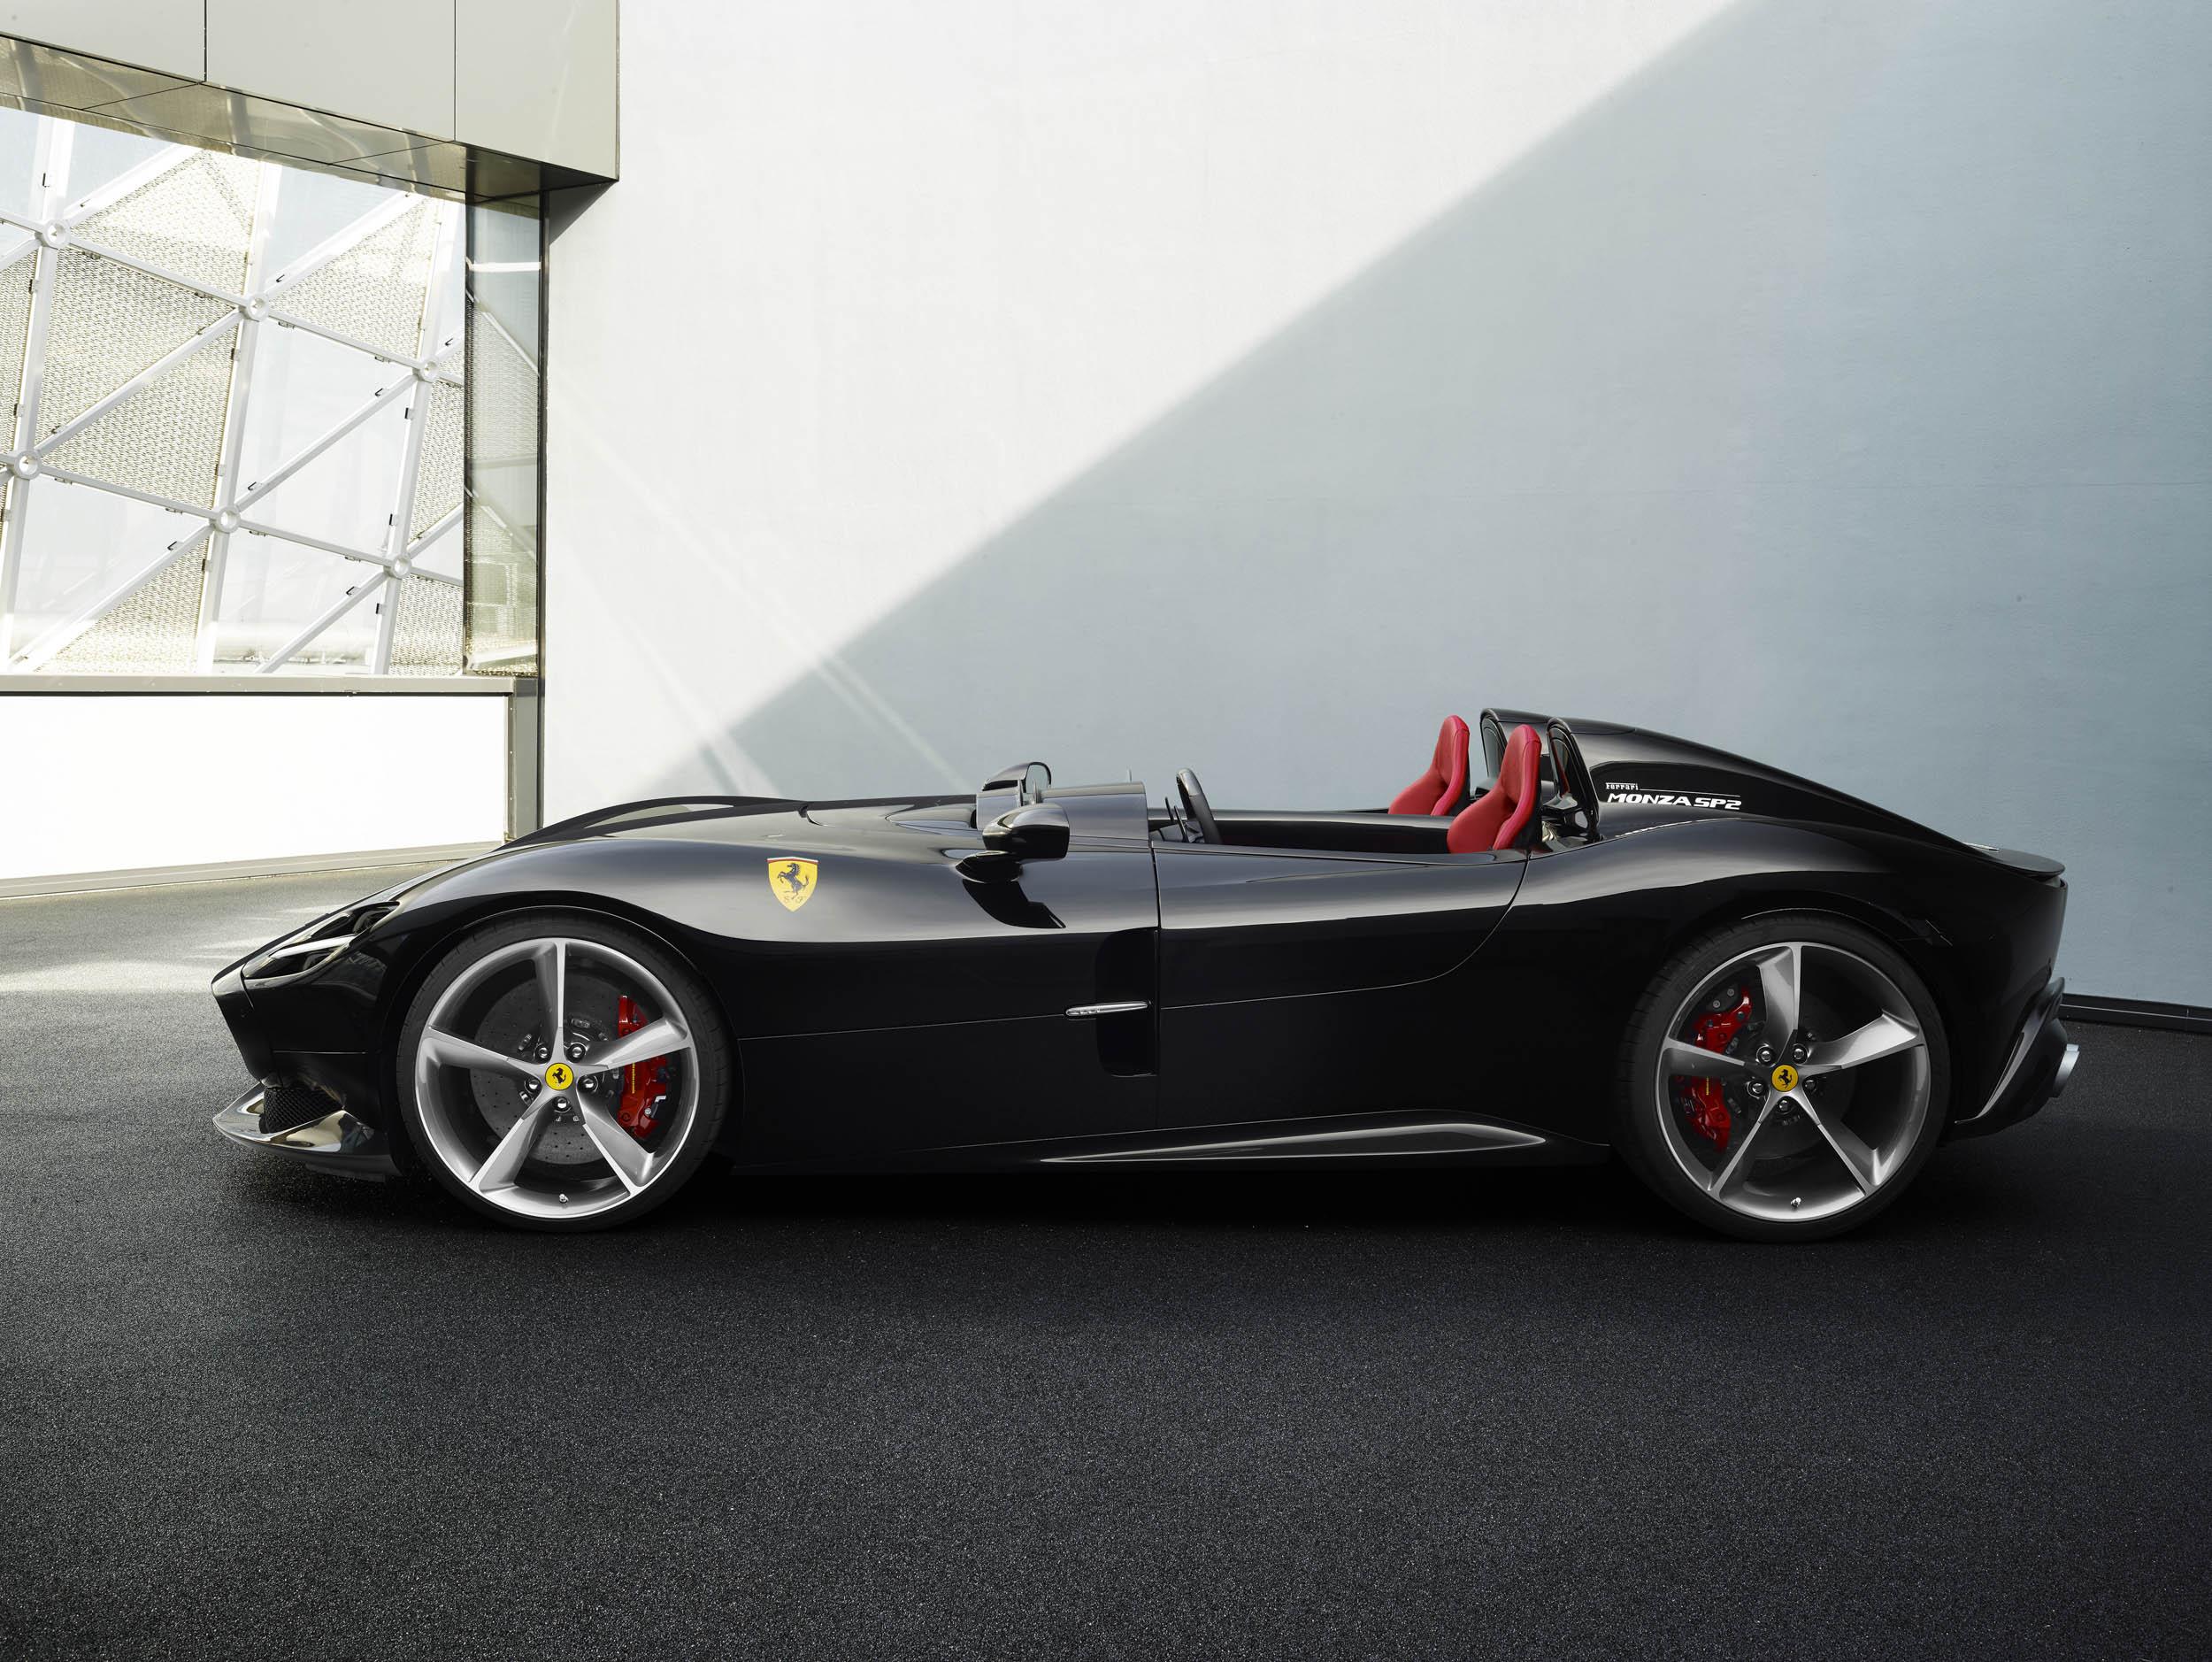 Ferrari Monza SP2 profile